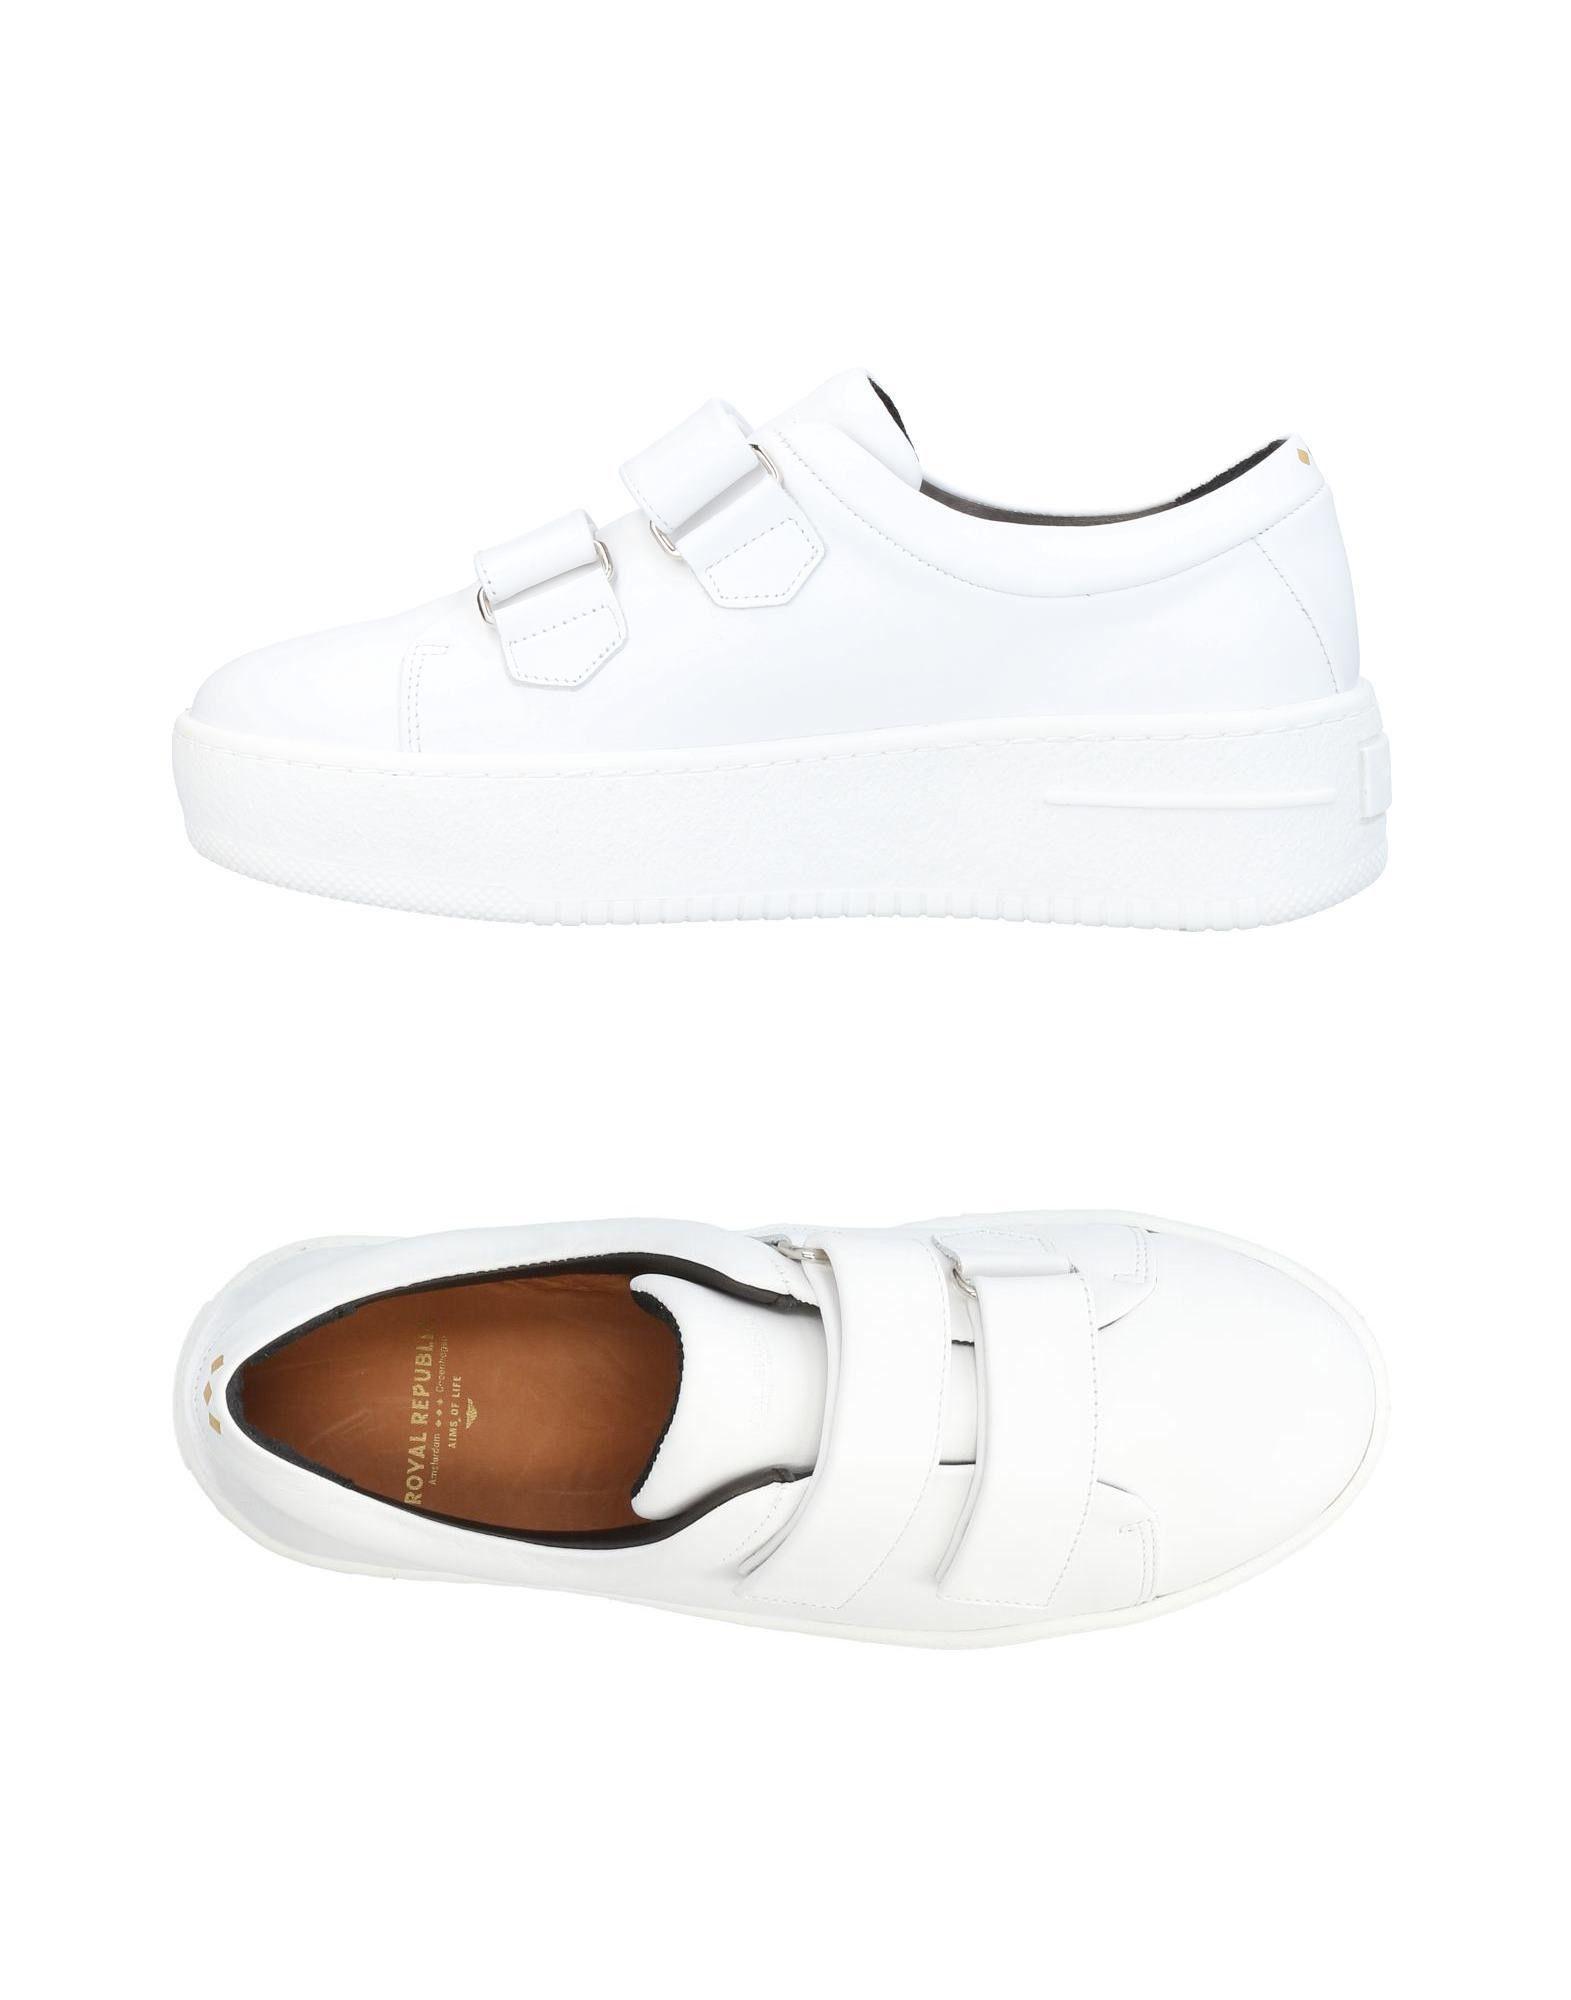 Stilvolle billige Schuhe Royal Republiq Sneakers Damen  11416839JQ